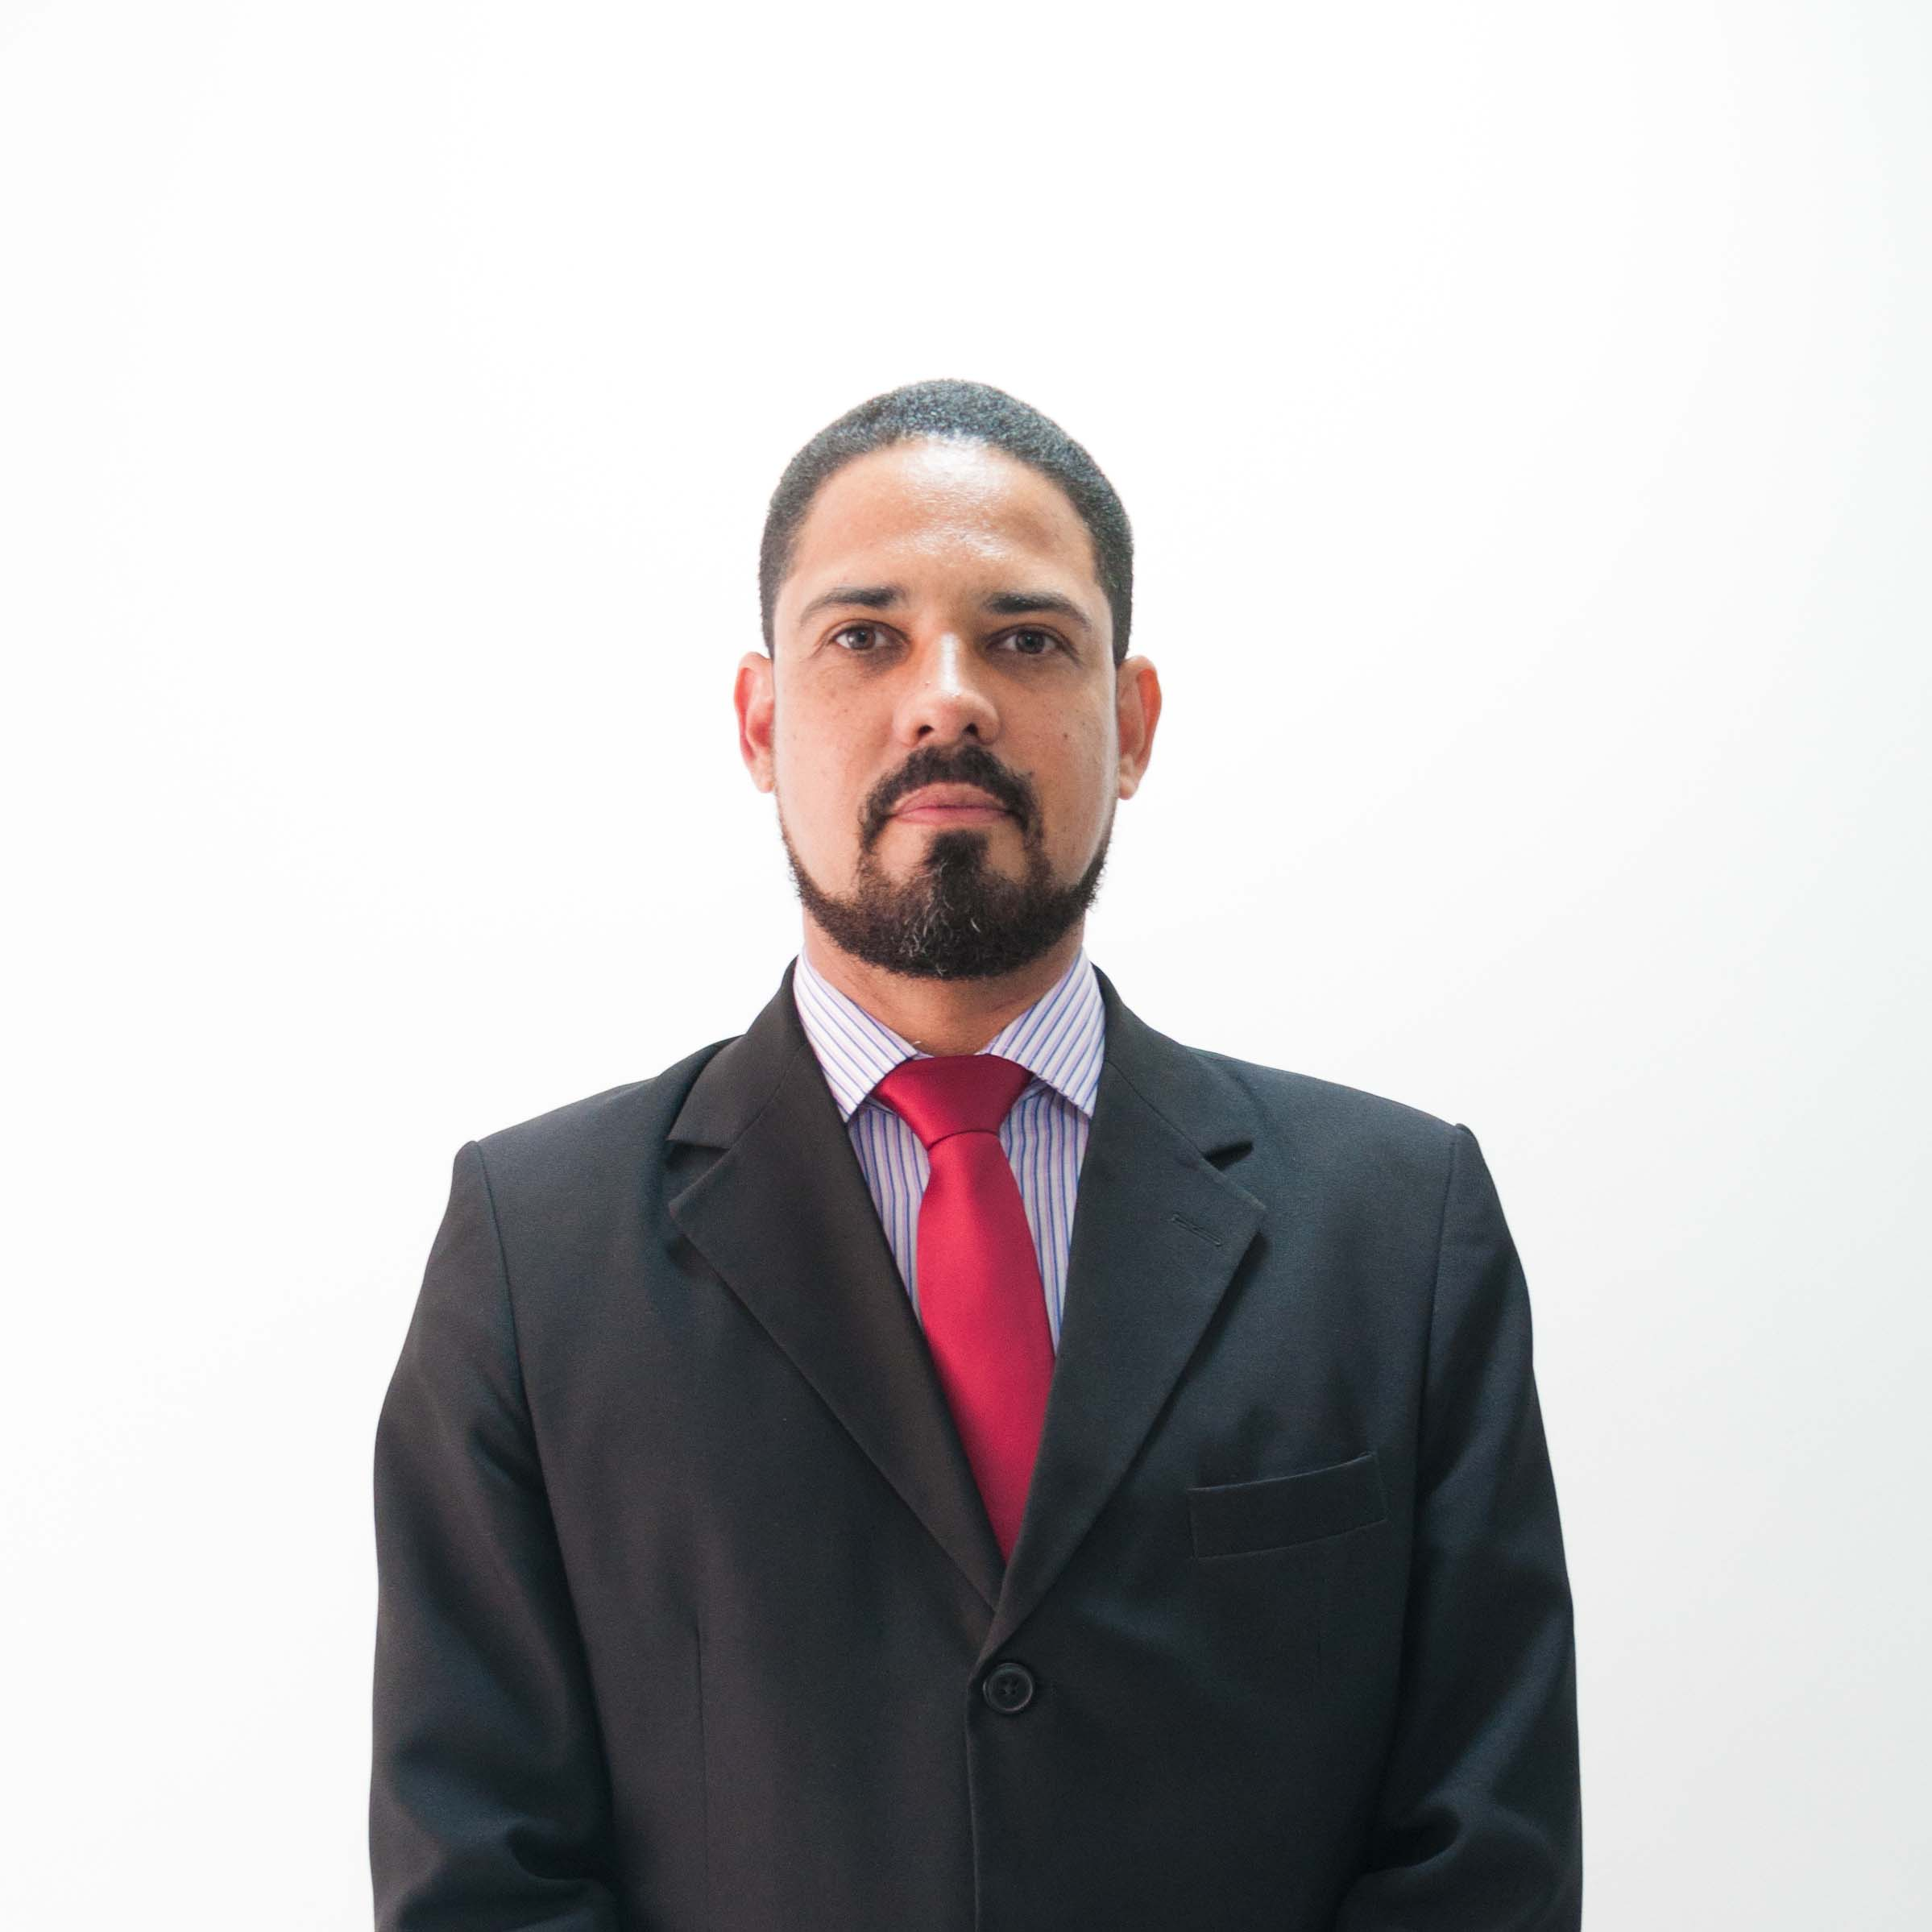 Everaldo Duque